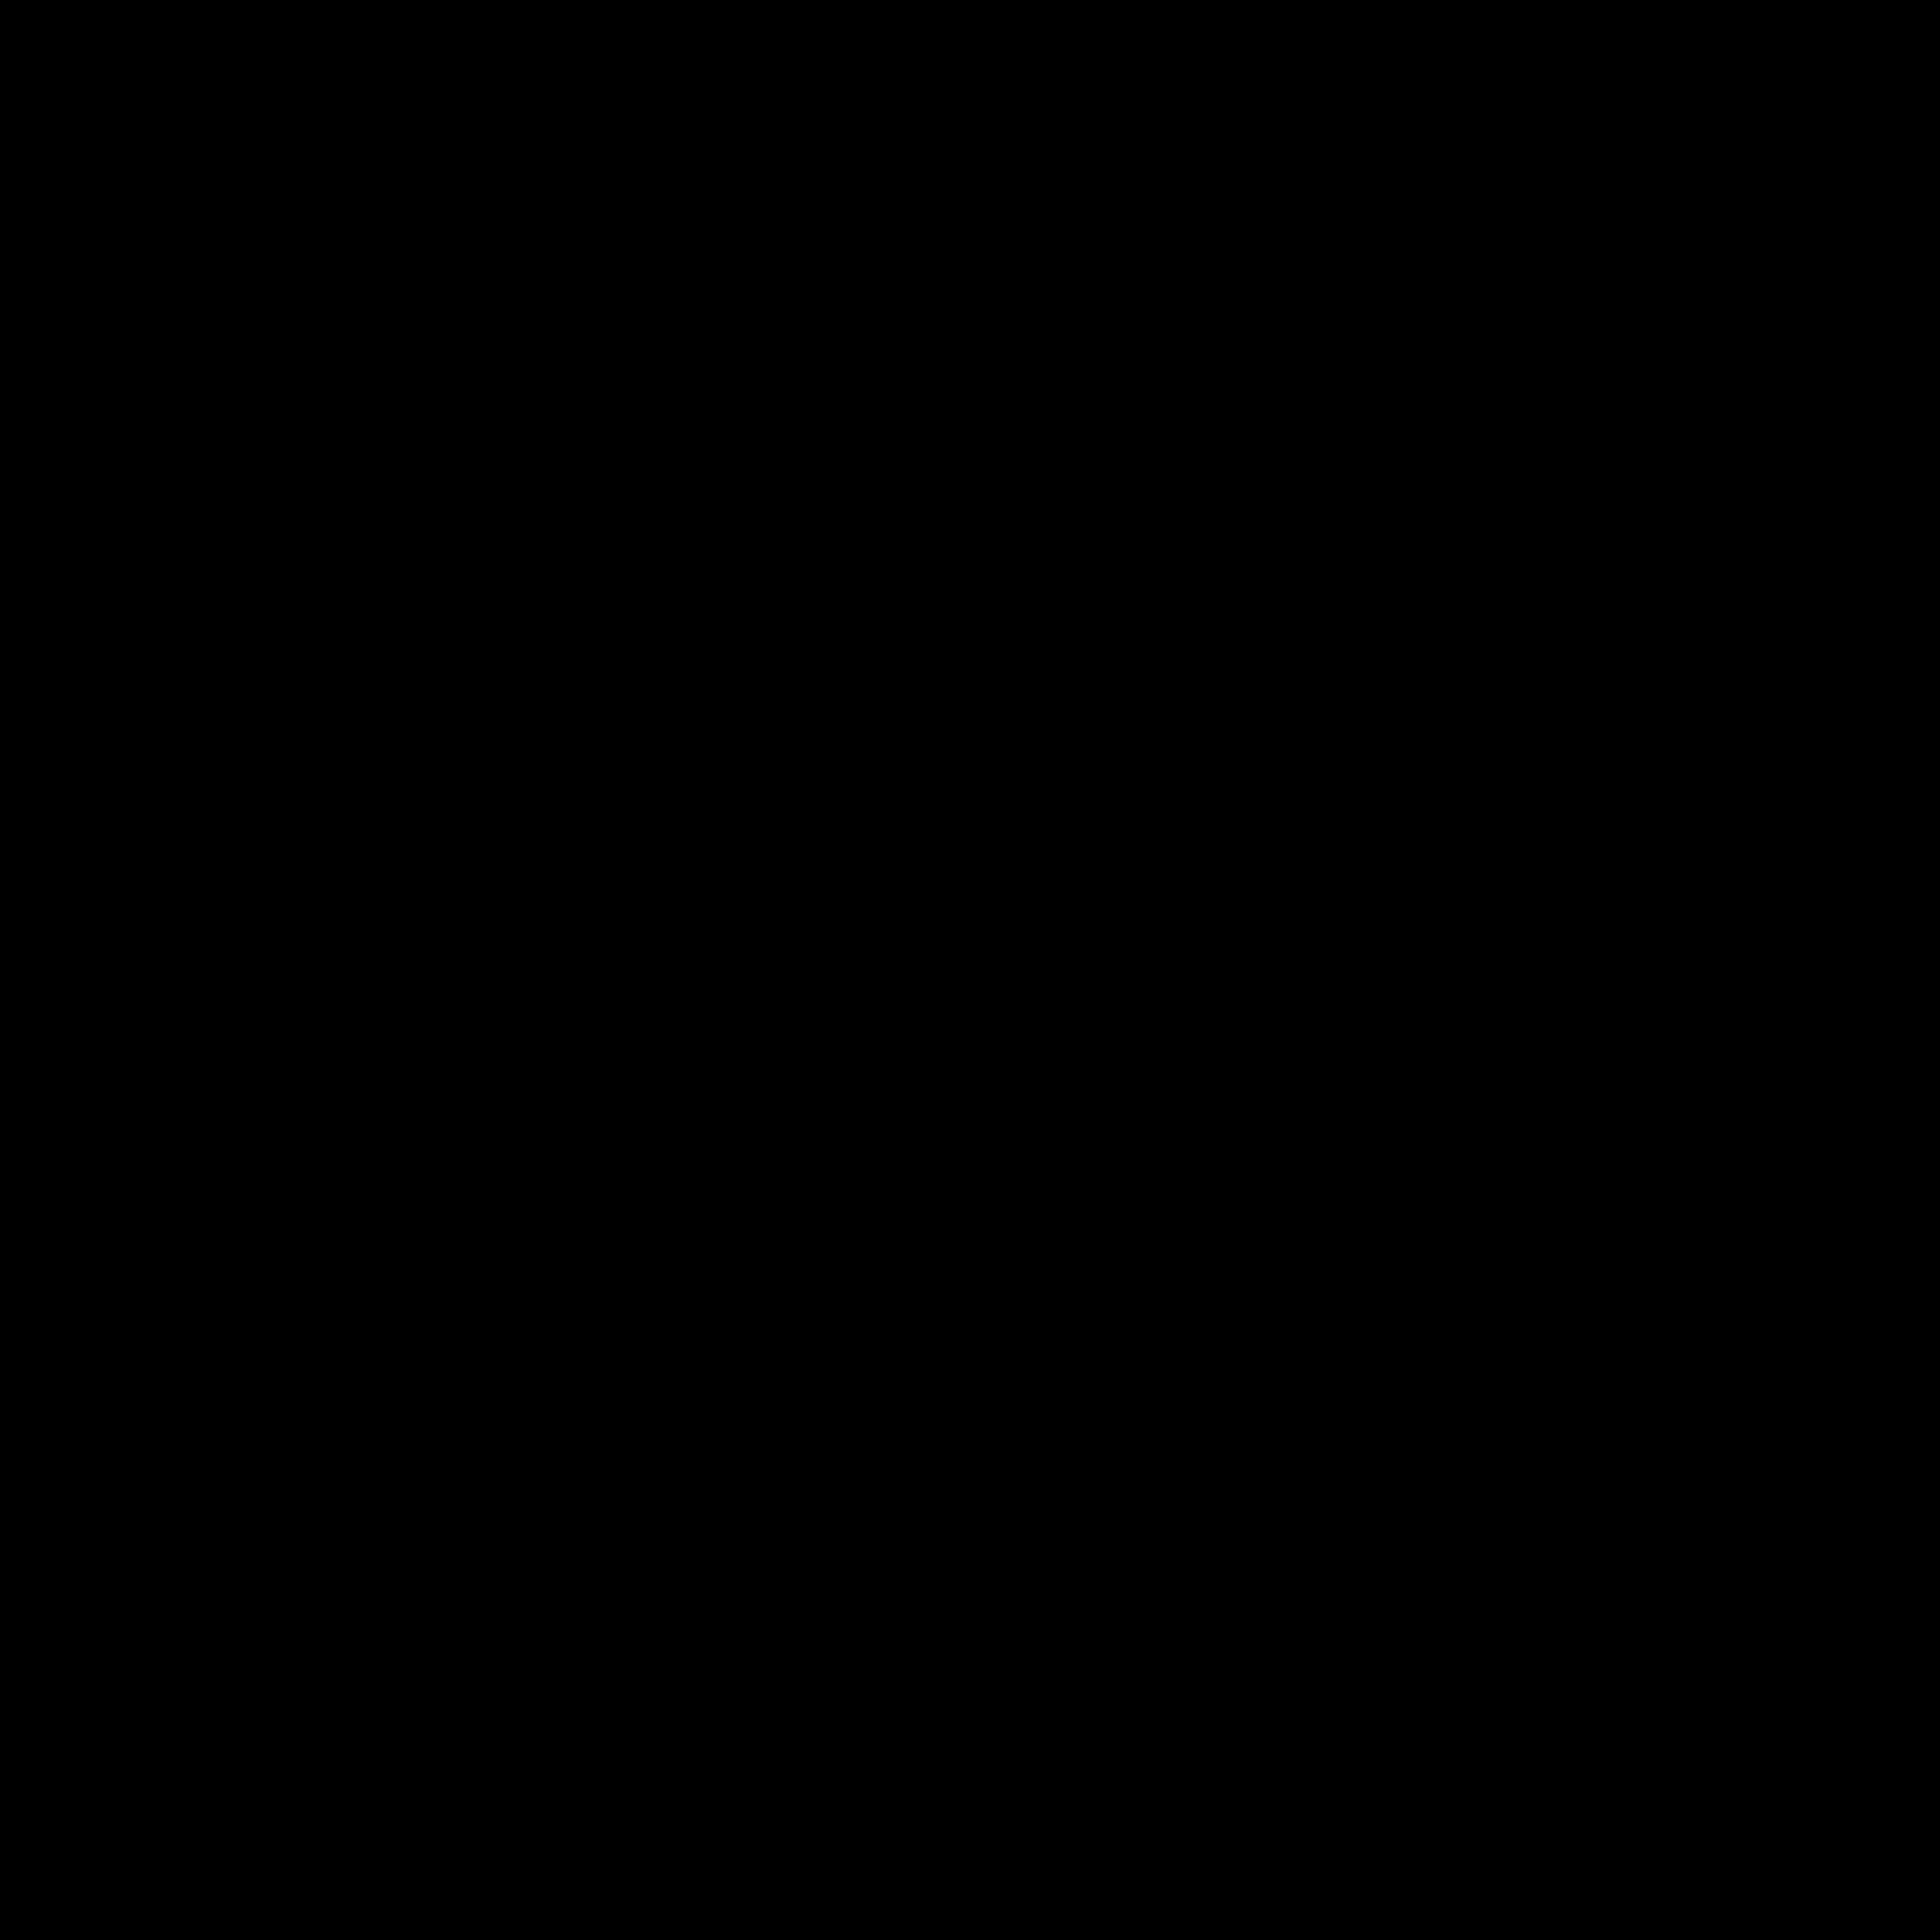 airbnb-logo-black-transparent.png